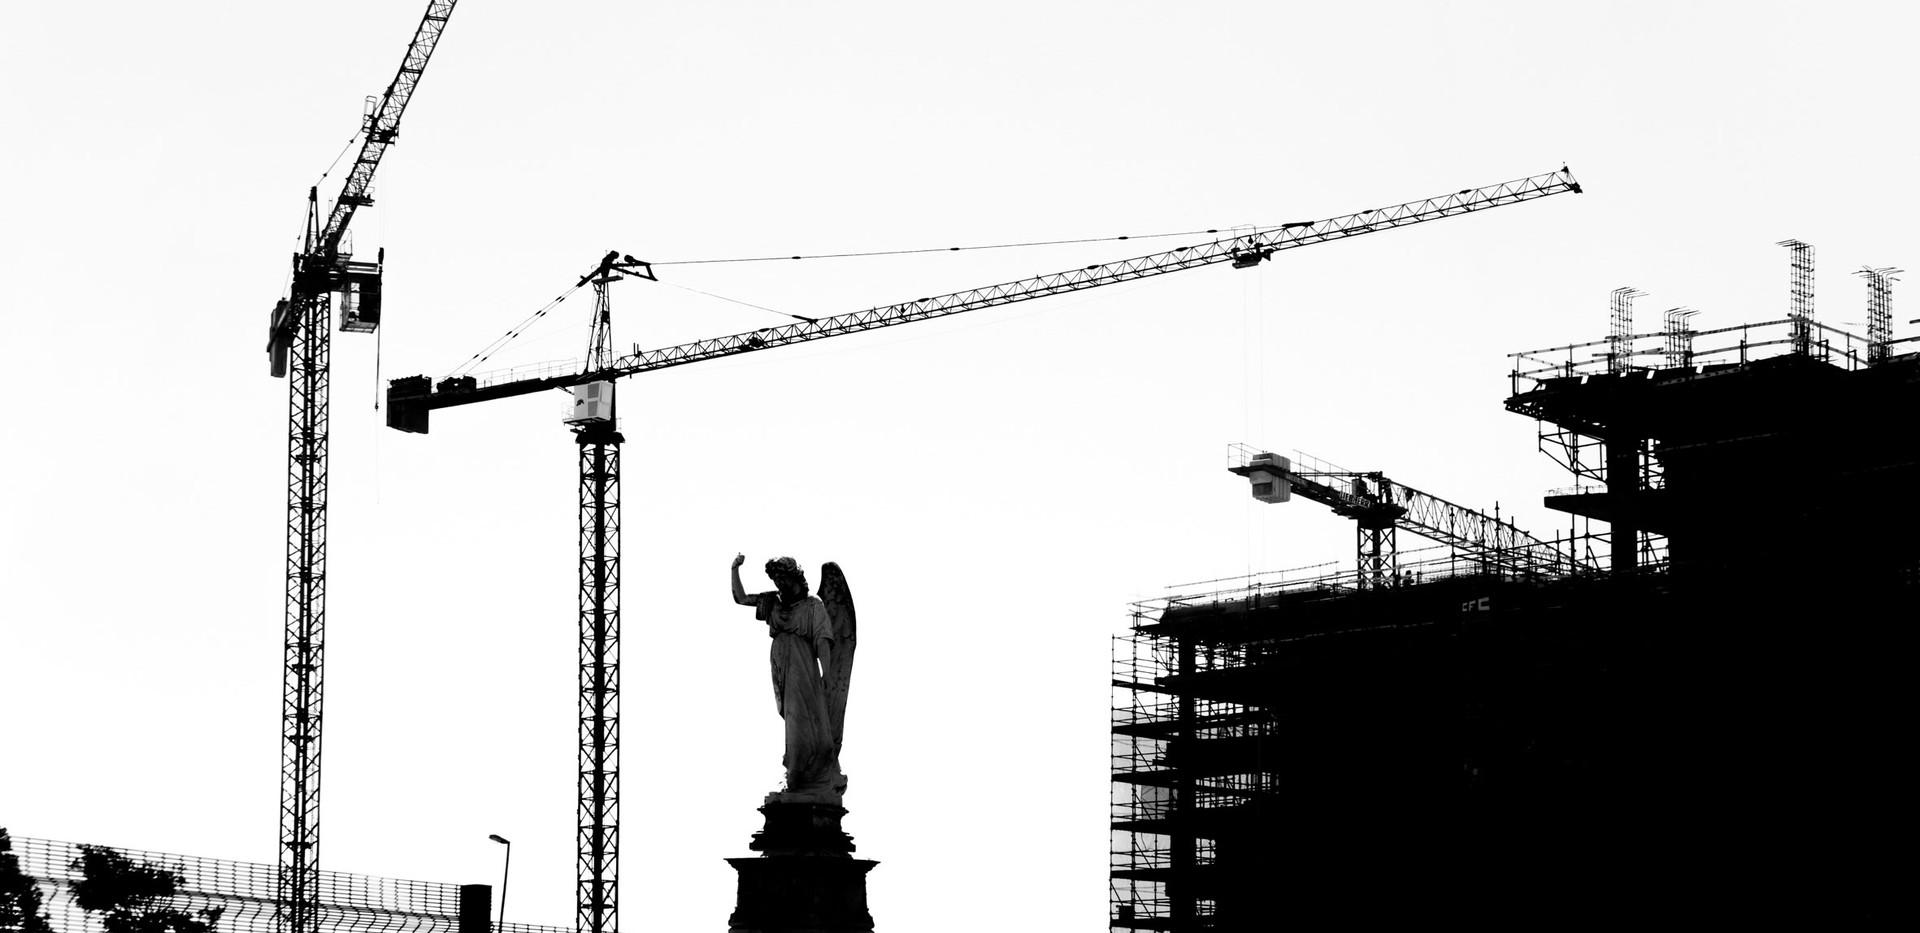 Urban-Angel-WM-optimized.jpg